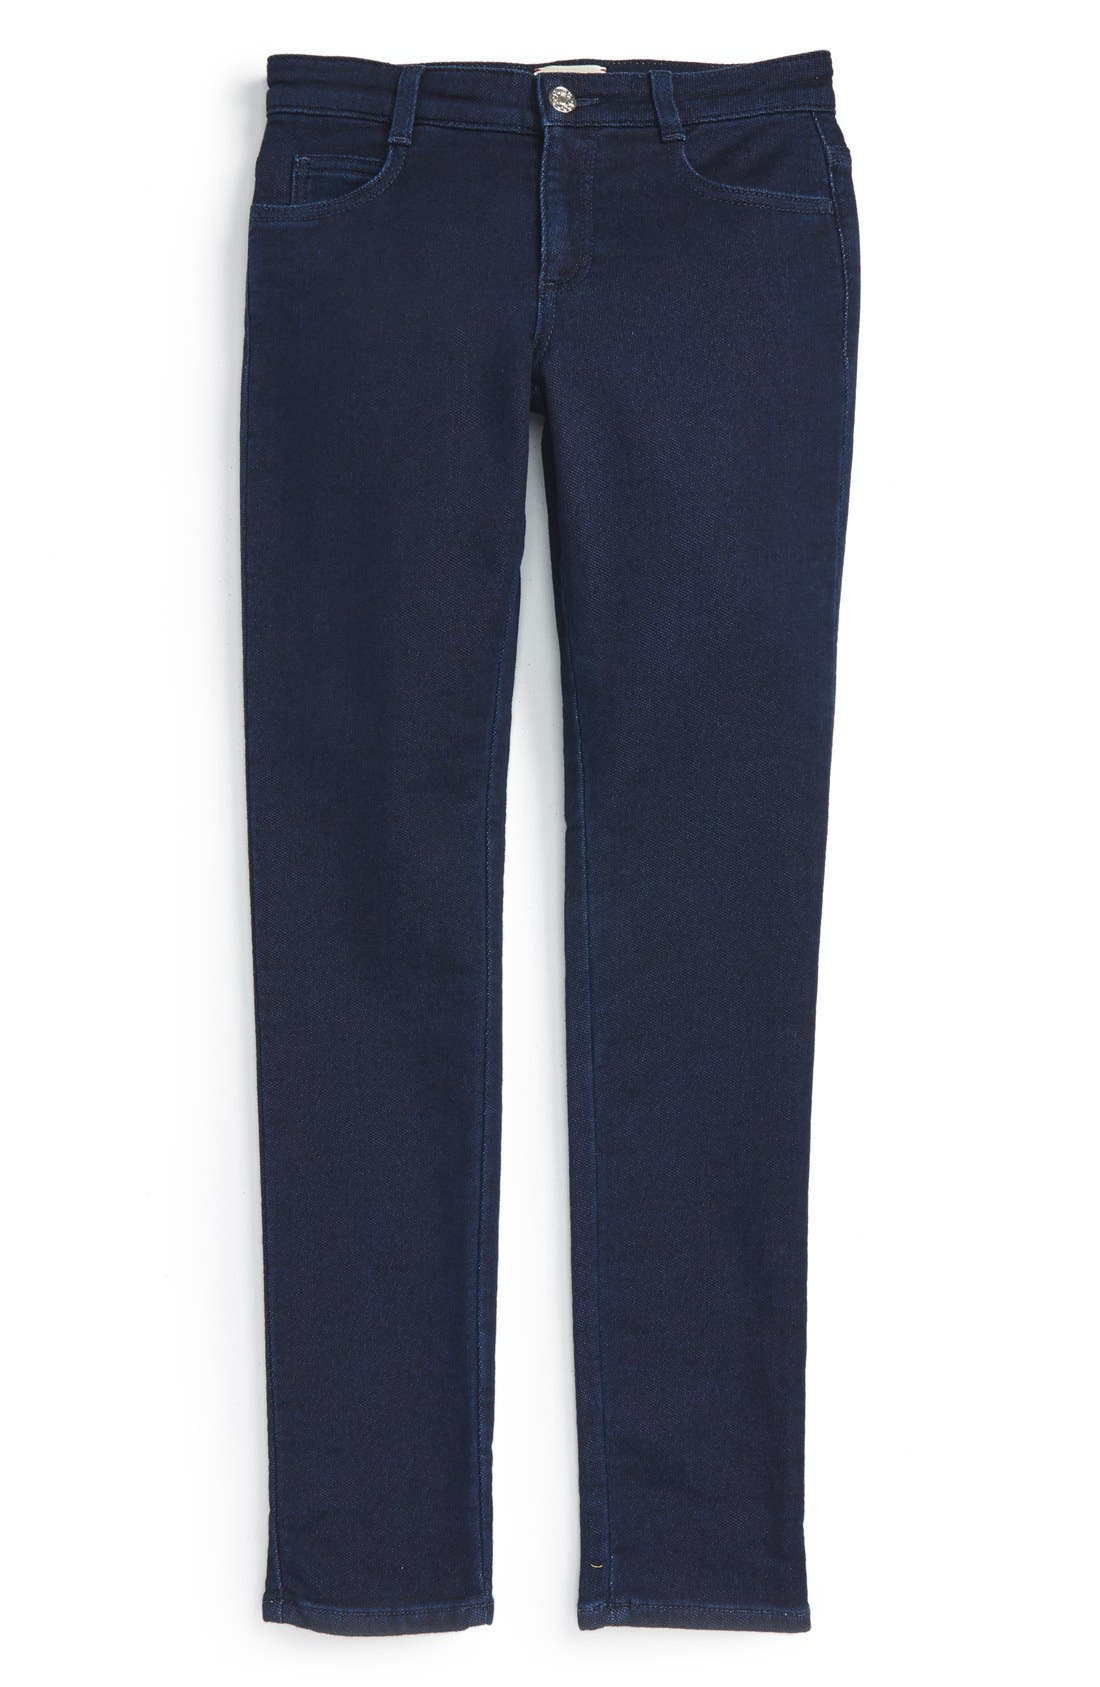 Skinny Knit Pants,                             Main thumbnail 1, color,                             Indigo Multi